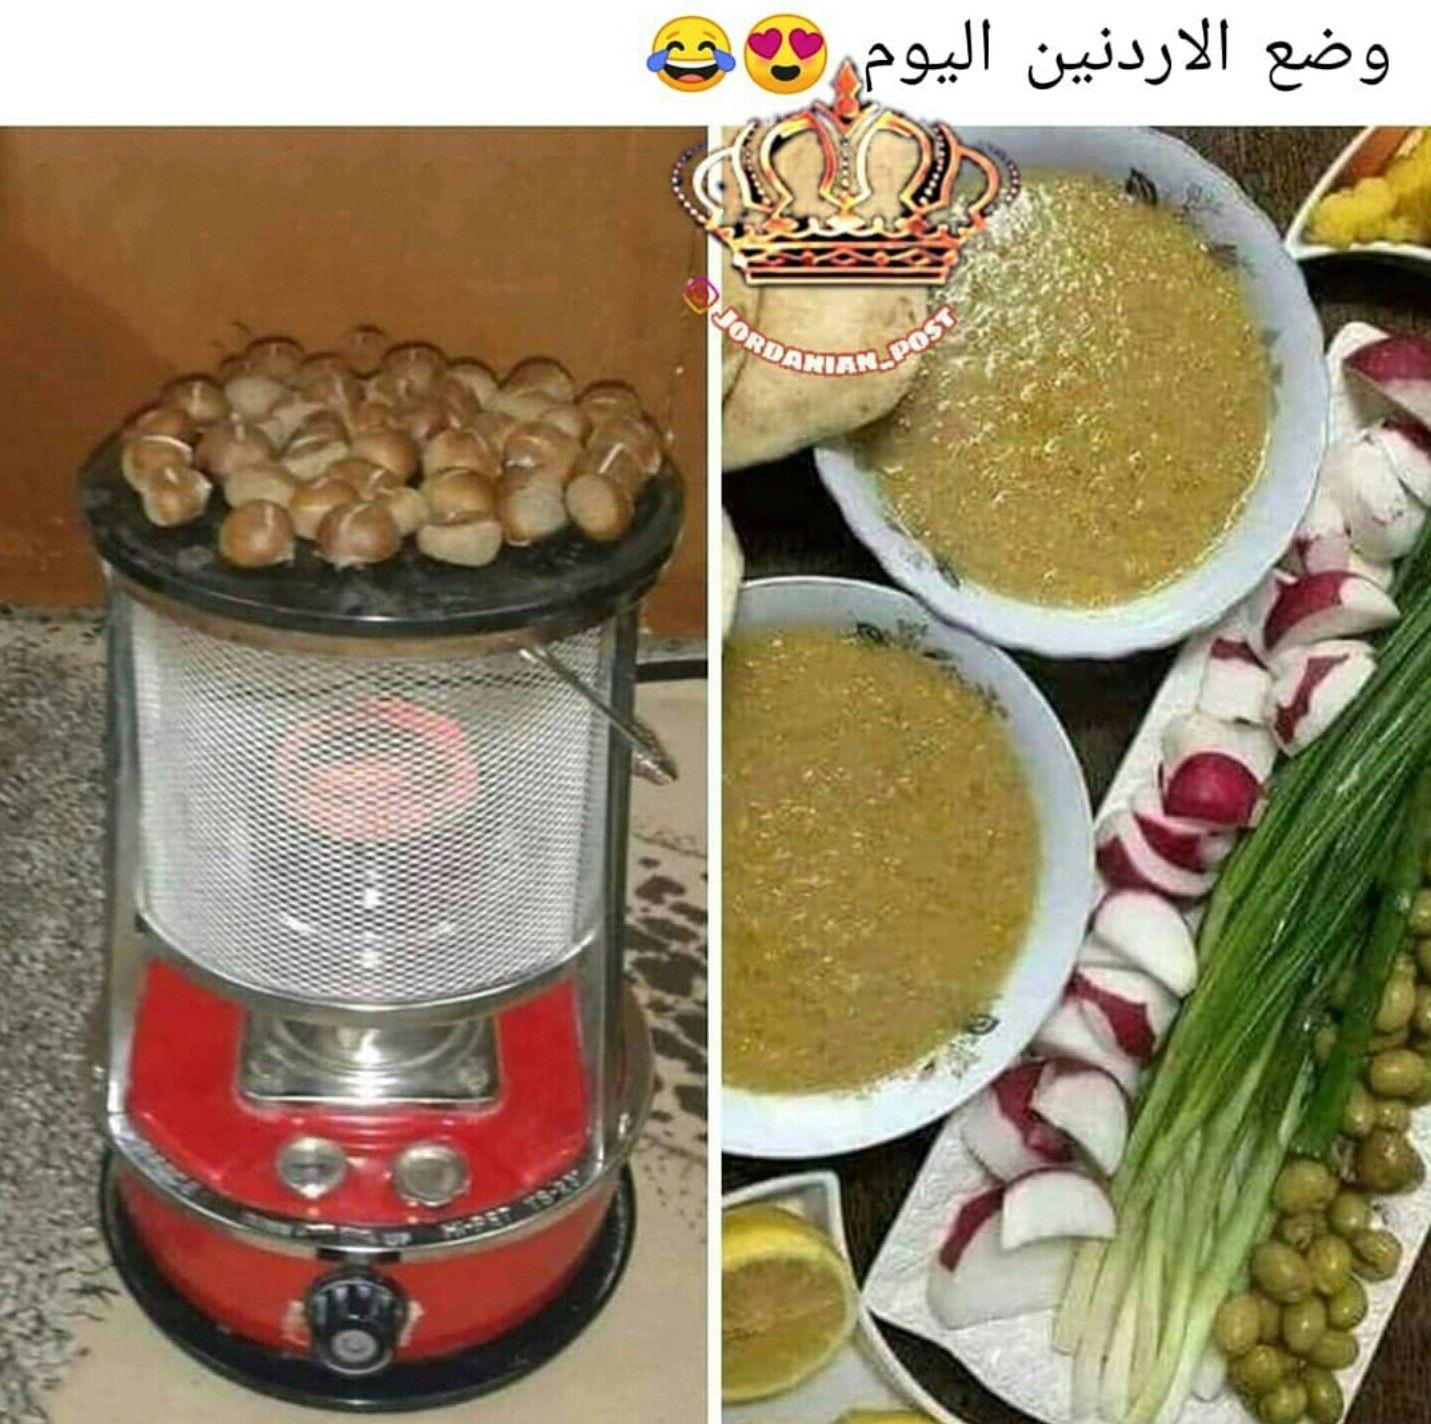 Pin By Heba Esleem On ابتسامة ᴗ Funny Kitchen Appliances Popcorn Maker Kitchen